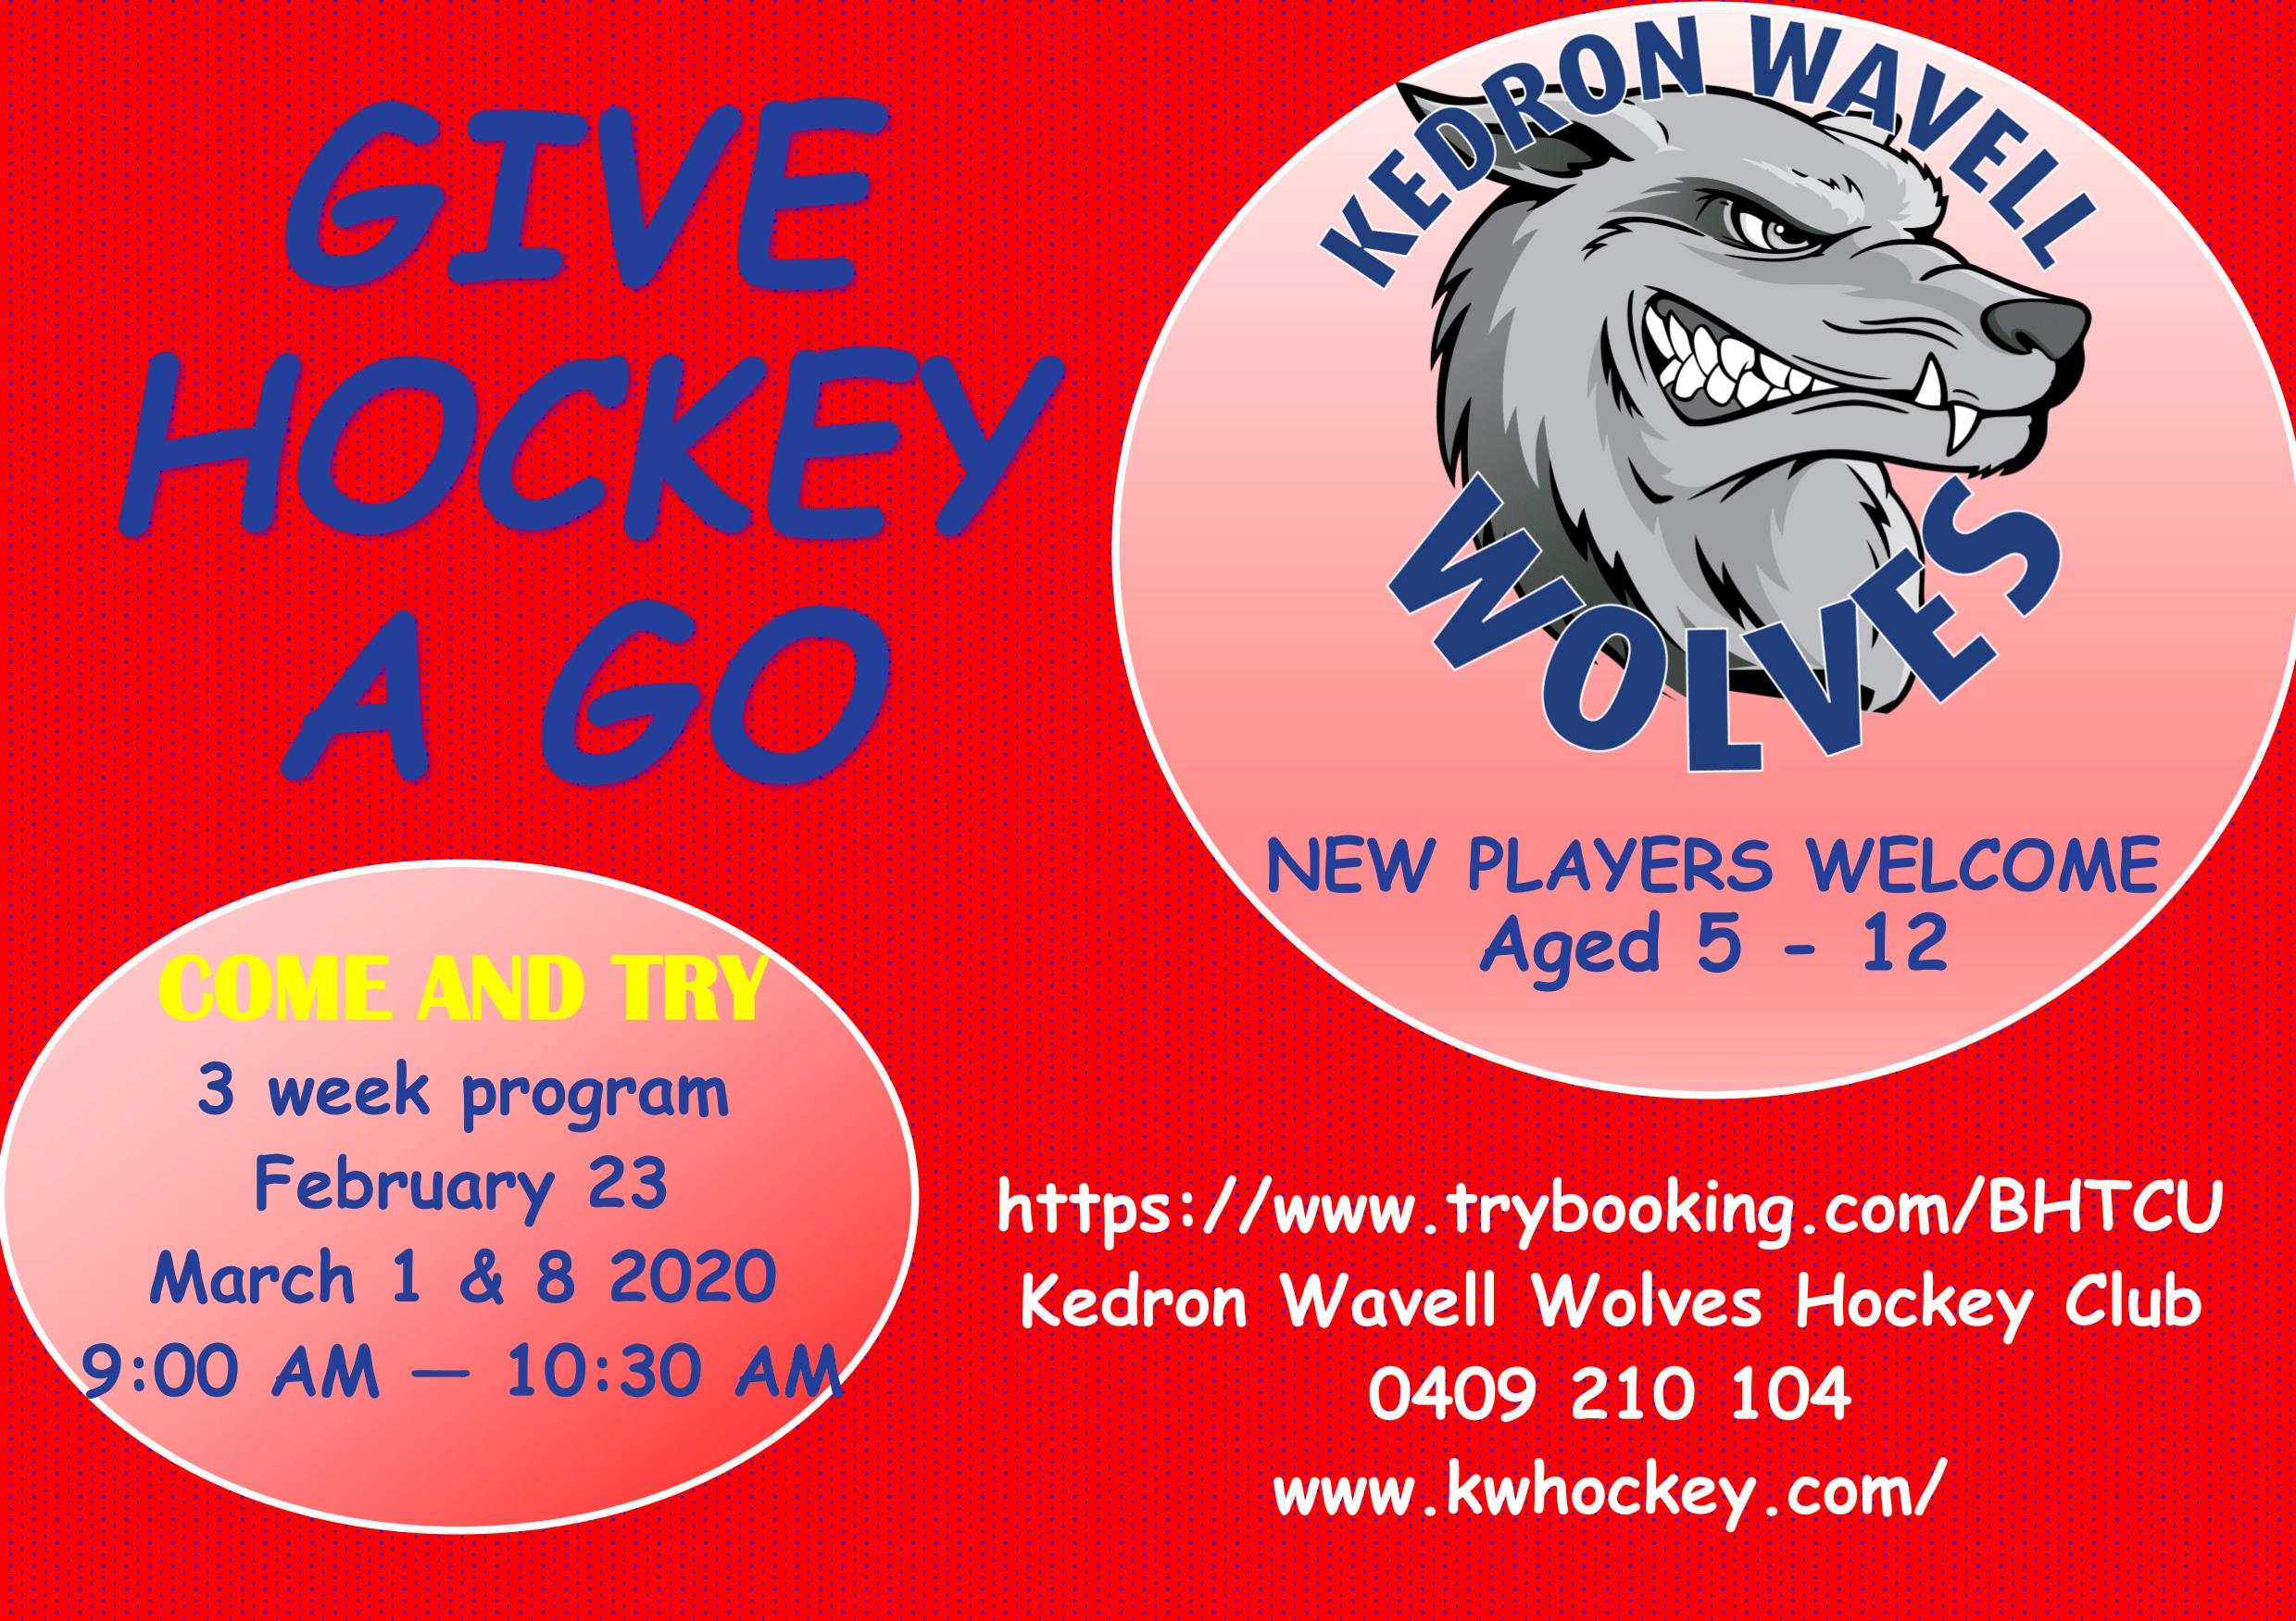 2020 Give Hockey A Go – 3 week Program